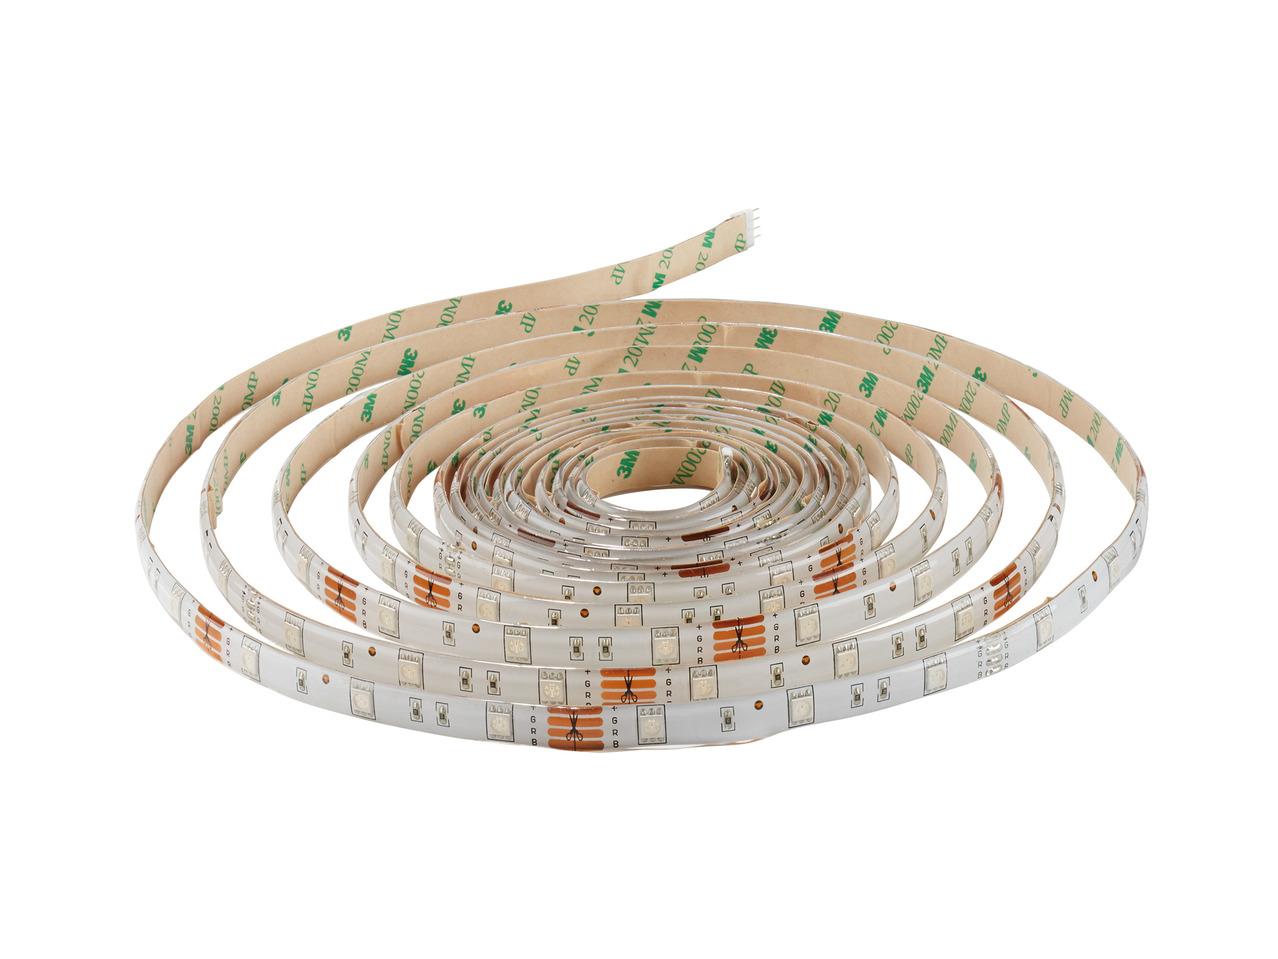 5m LED strip light instore at Lidl for £14.99